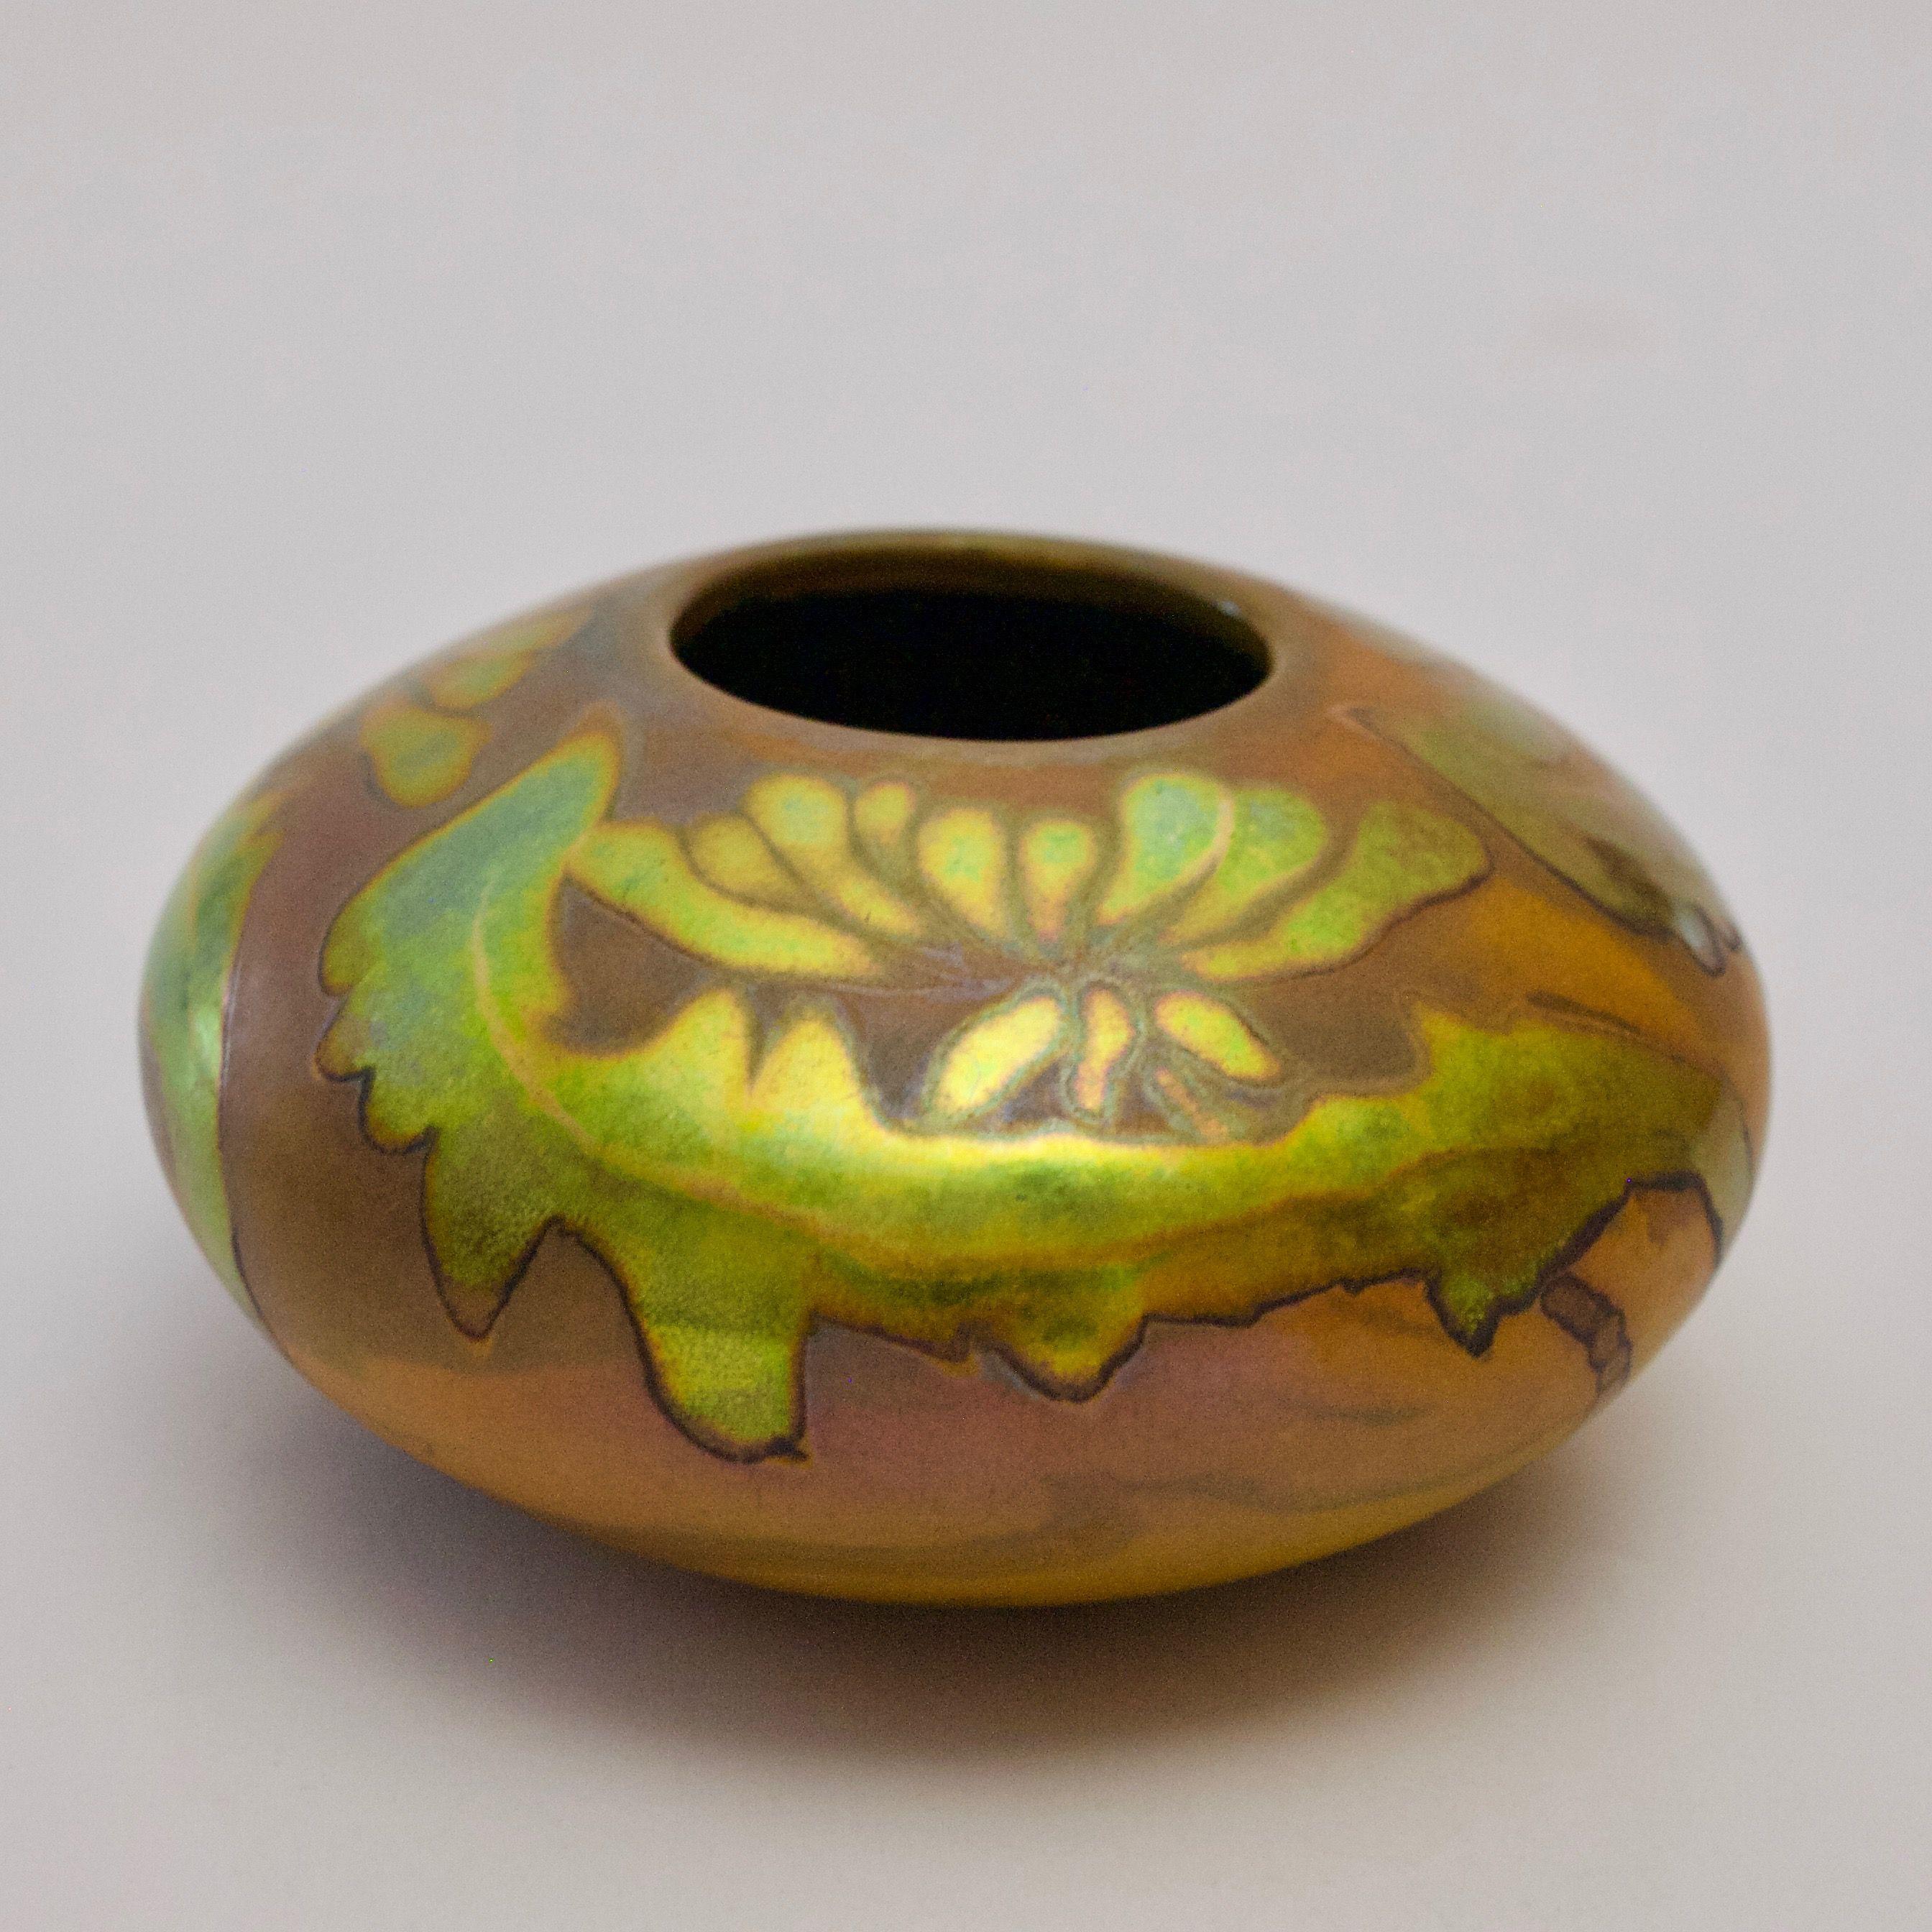 Zsolnay art nouveau / secession eosin vase obert.mario177